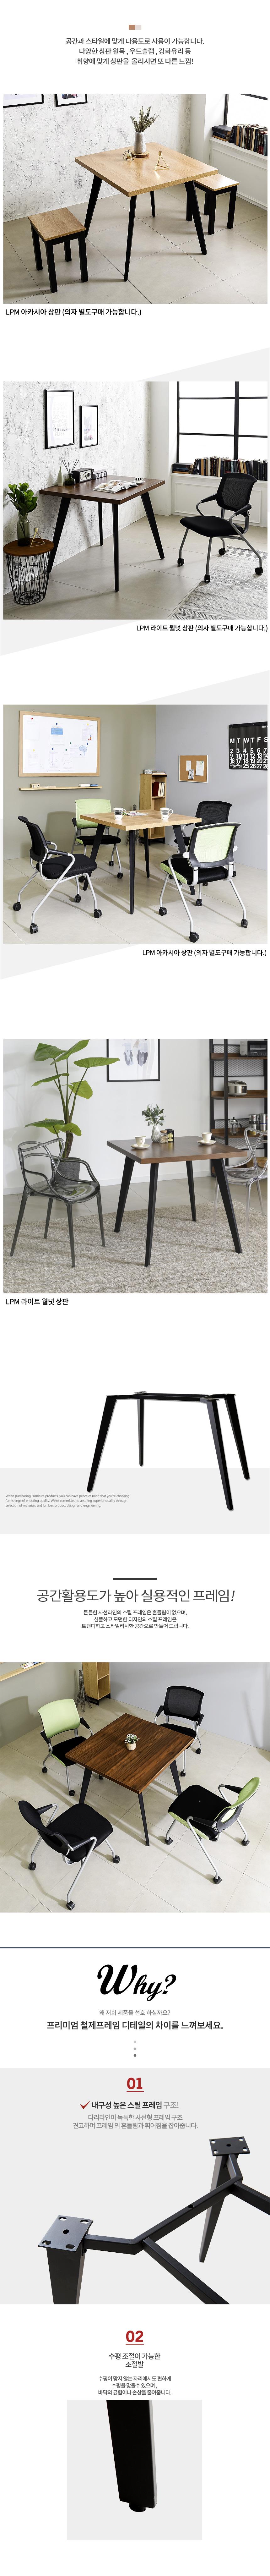 K22 900 철제 프레임 - 동화속나무, 130,000원, DIY 책상/의자, DIY 책상/테이블